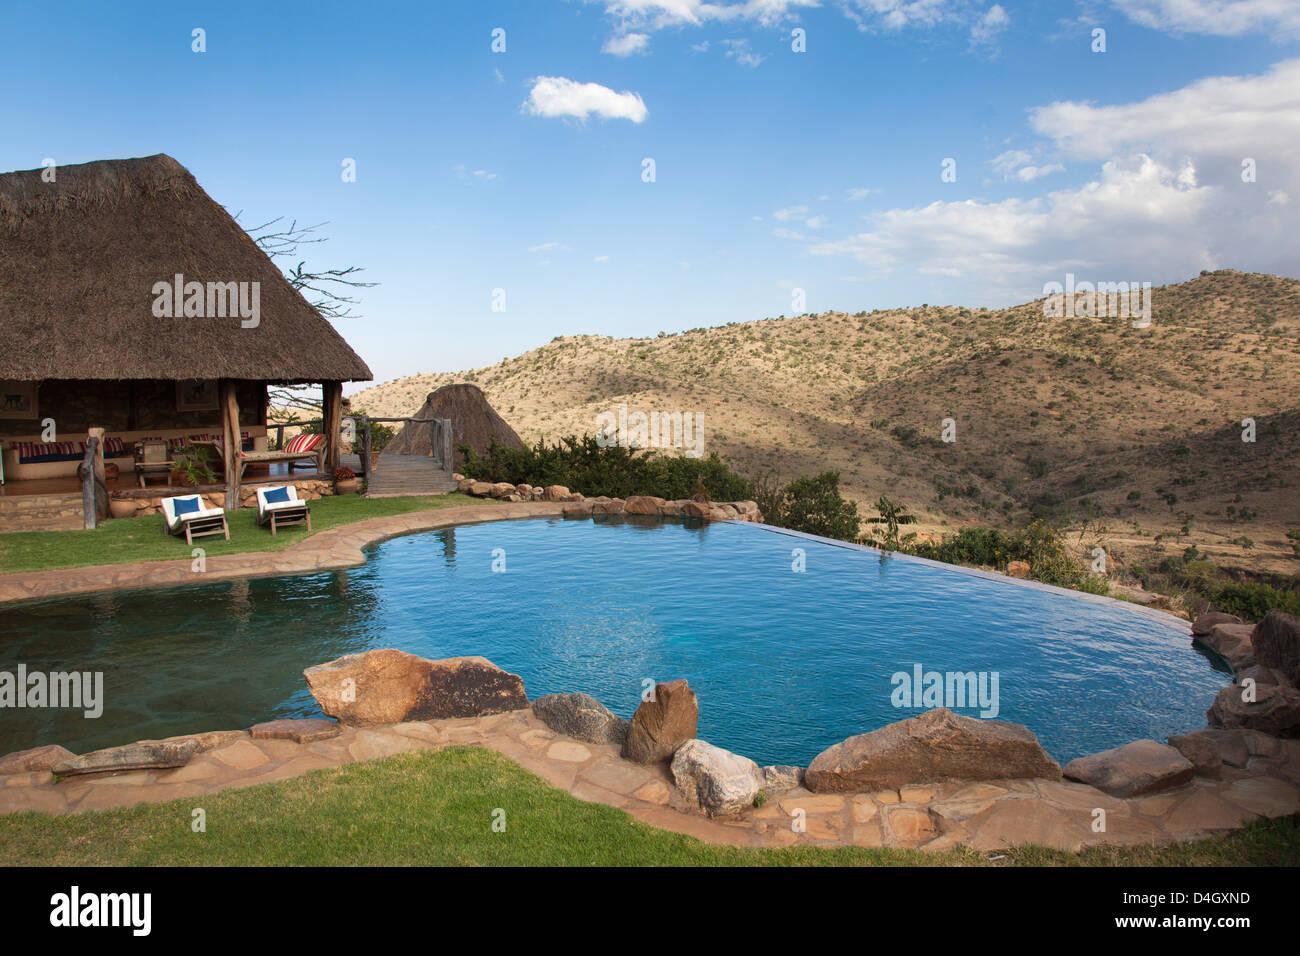 Infinity pool and view from Borana luxury safari lodge, Laikipia, Kenya, East Africa - Stock Image